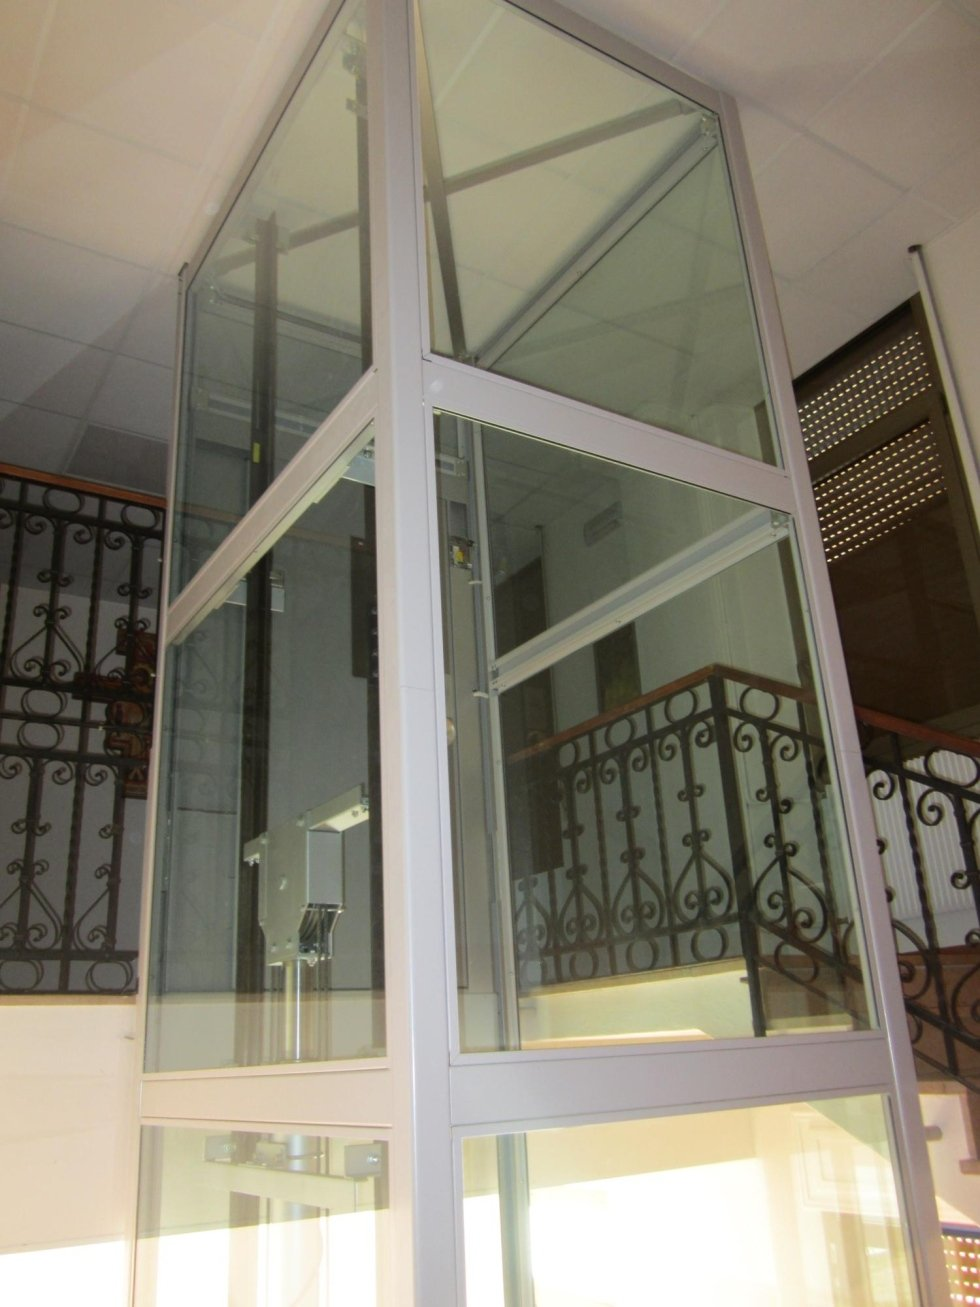 piattaforma elevatrice oleodinamica incastellatura e vetro